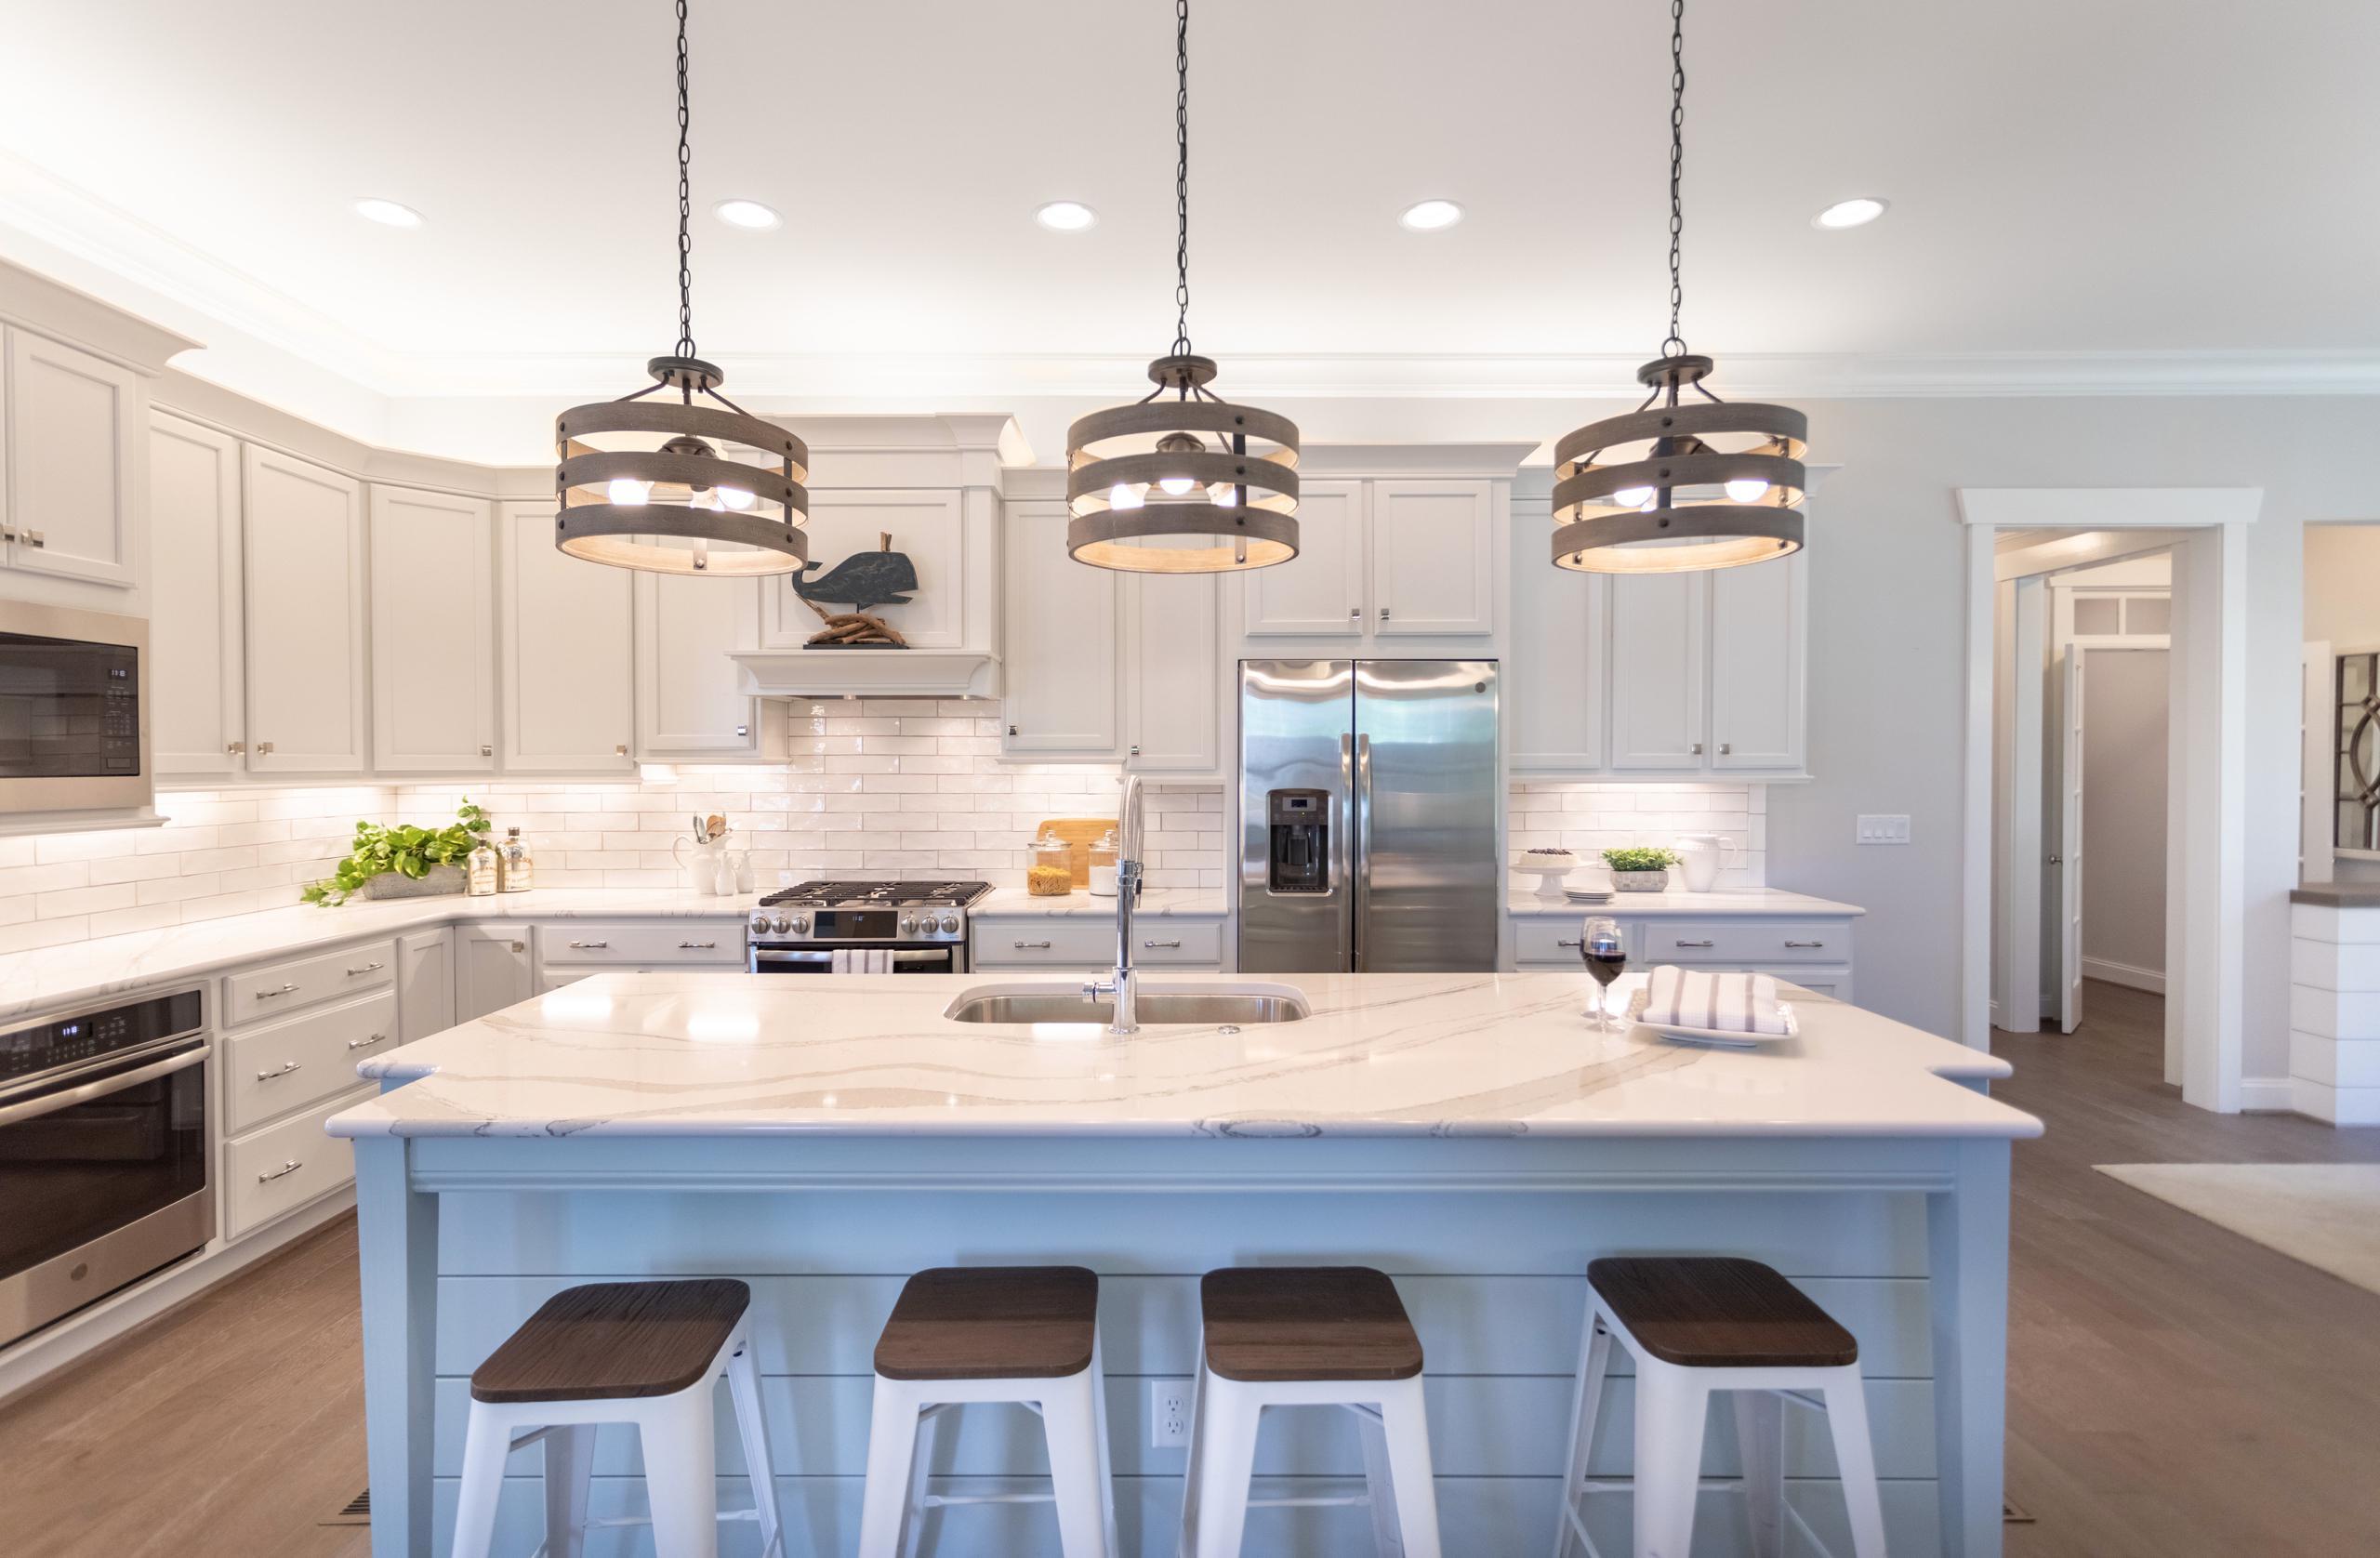 Kitchen featured in The Waverly By Stephen Alexander Homes in Norfolk-Newport News, VA